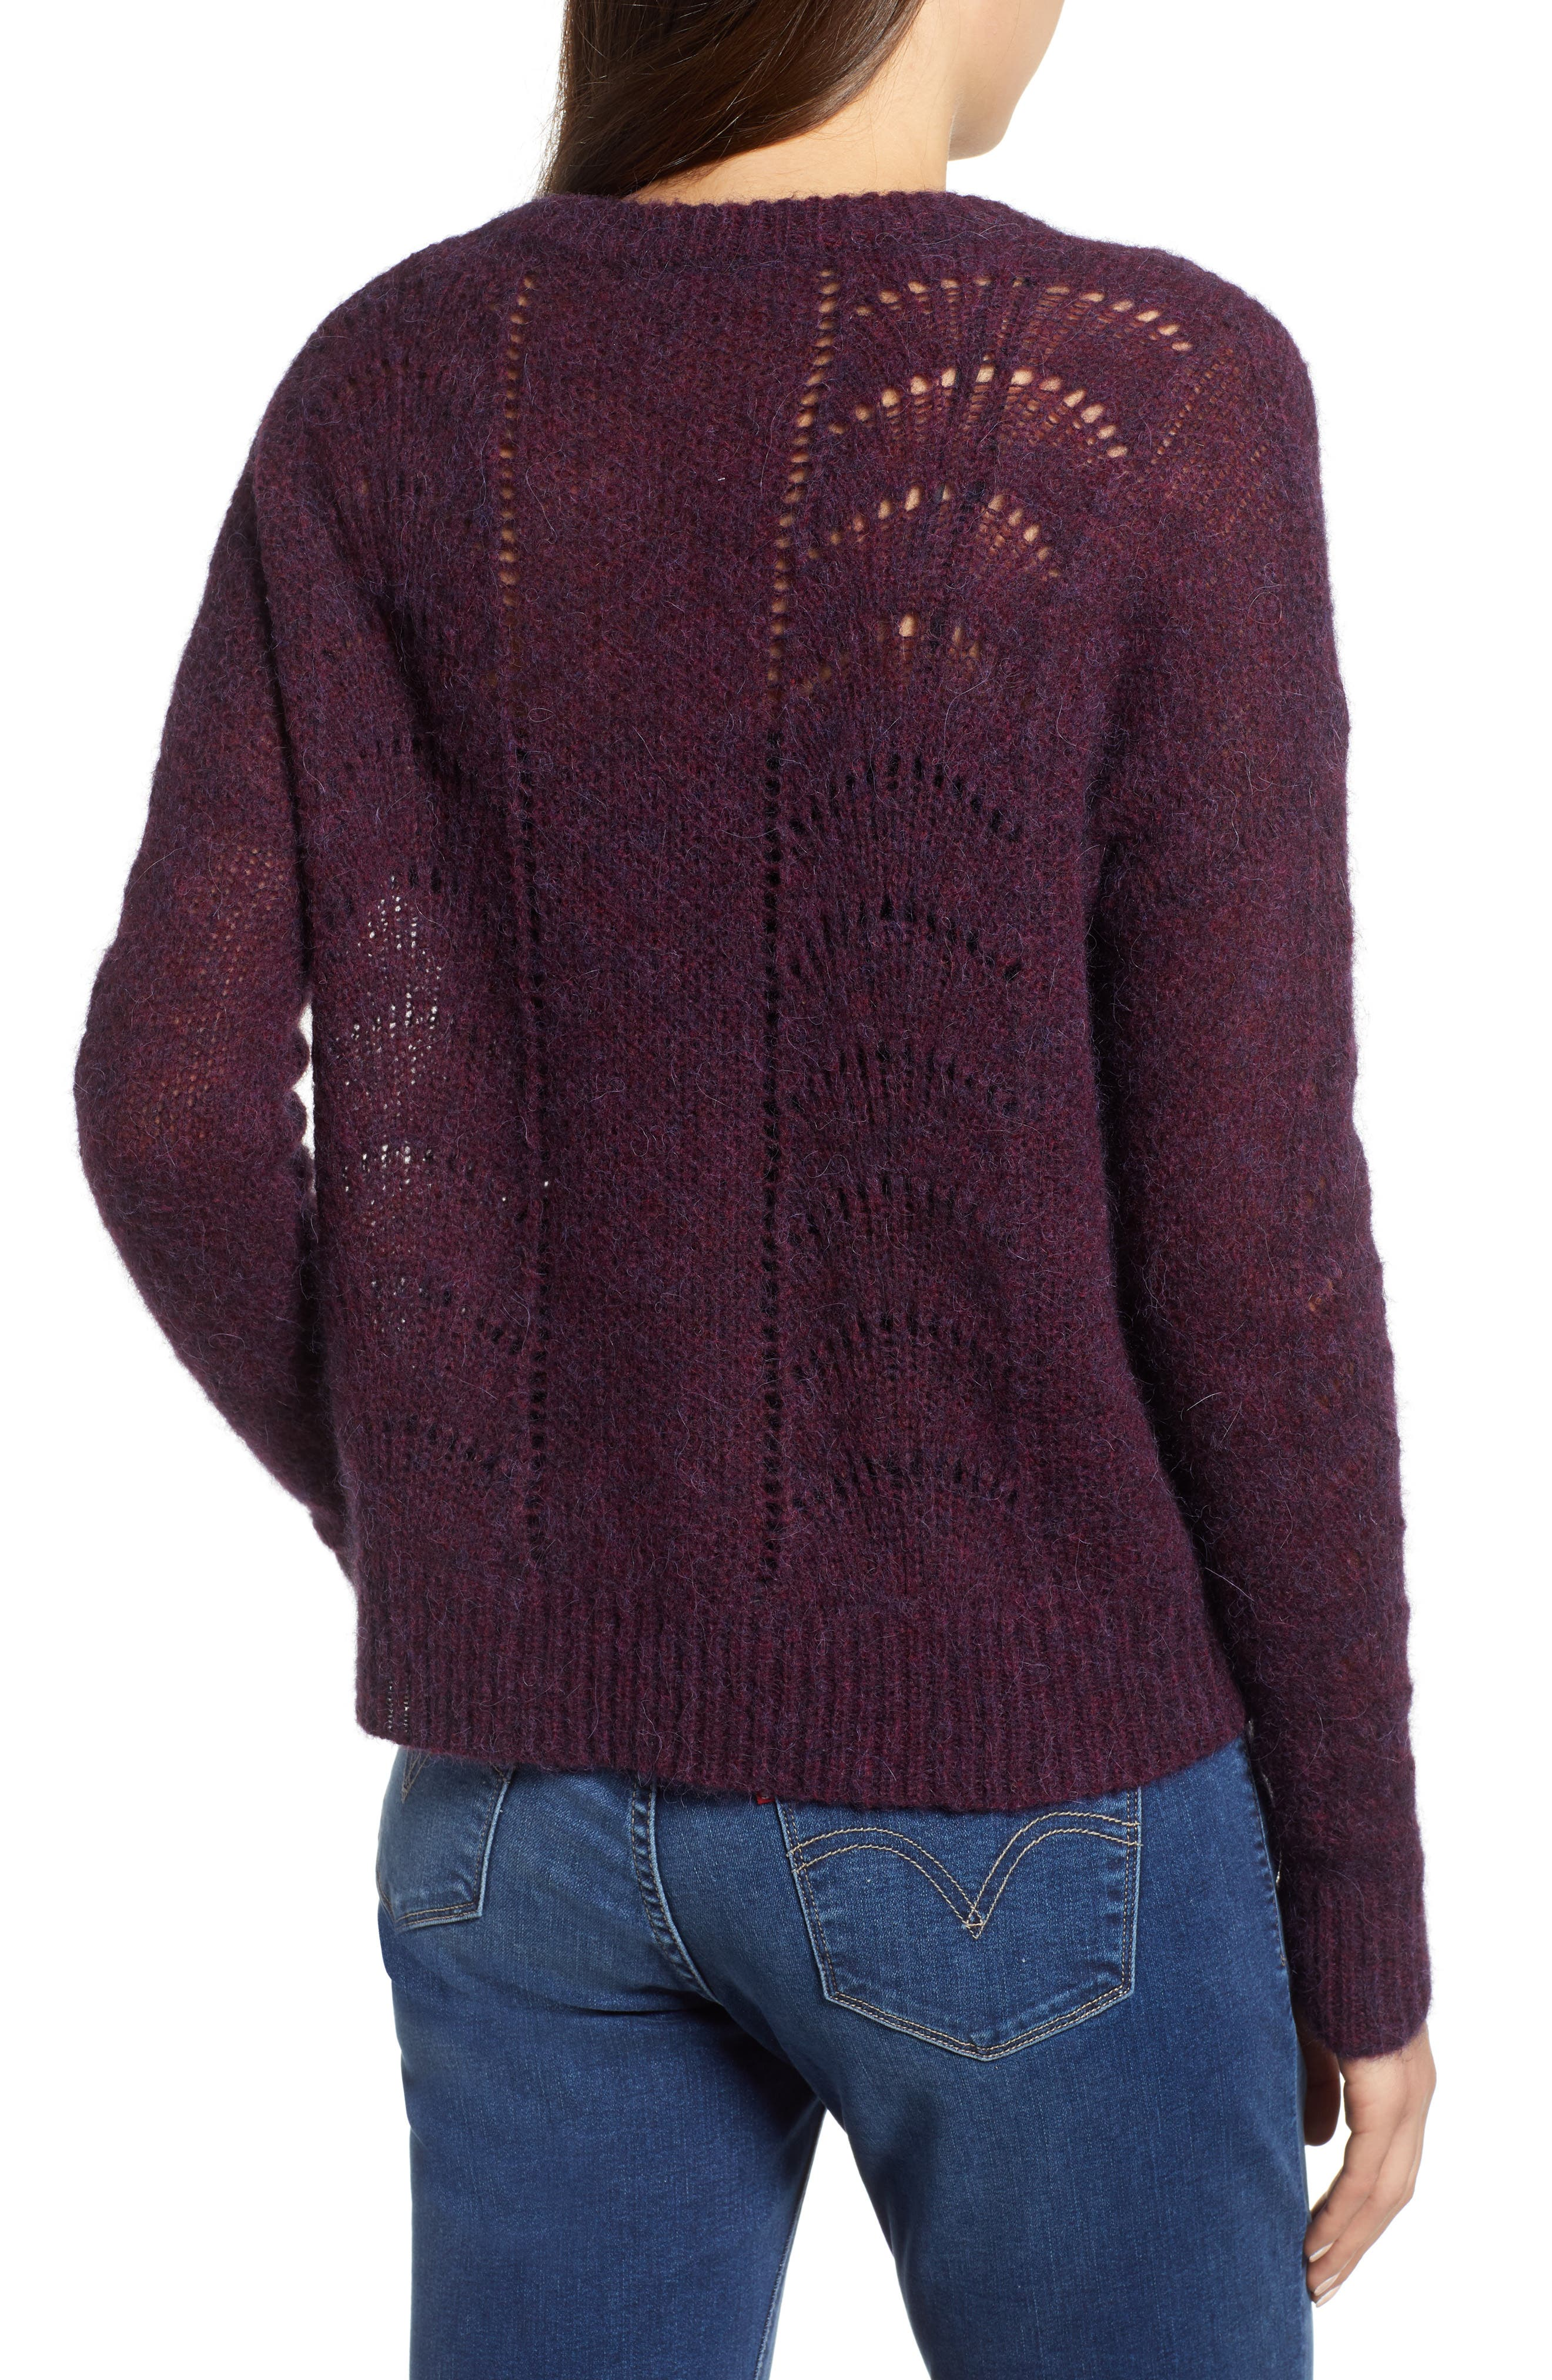 Mara Sweater,                             Alternate thumbnail 2, color,                             BLACKBERRY